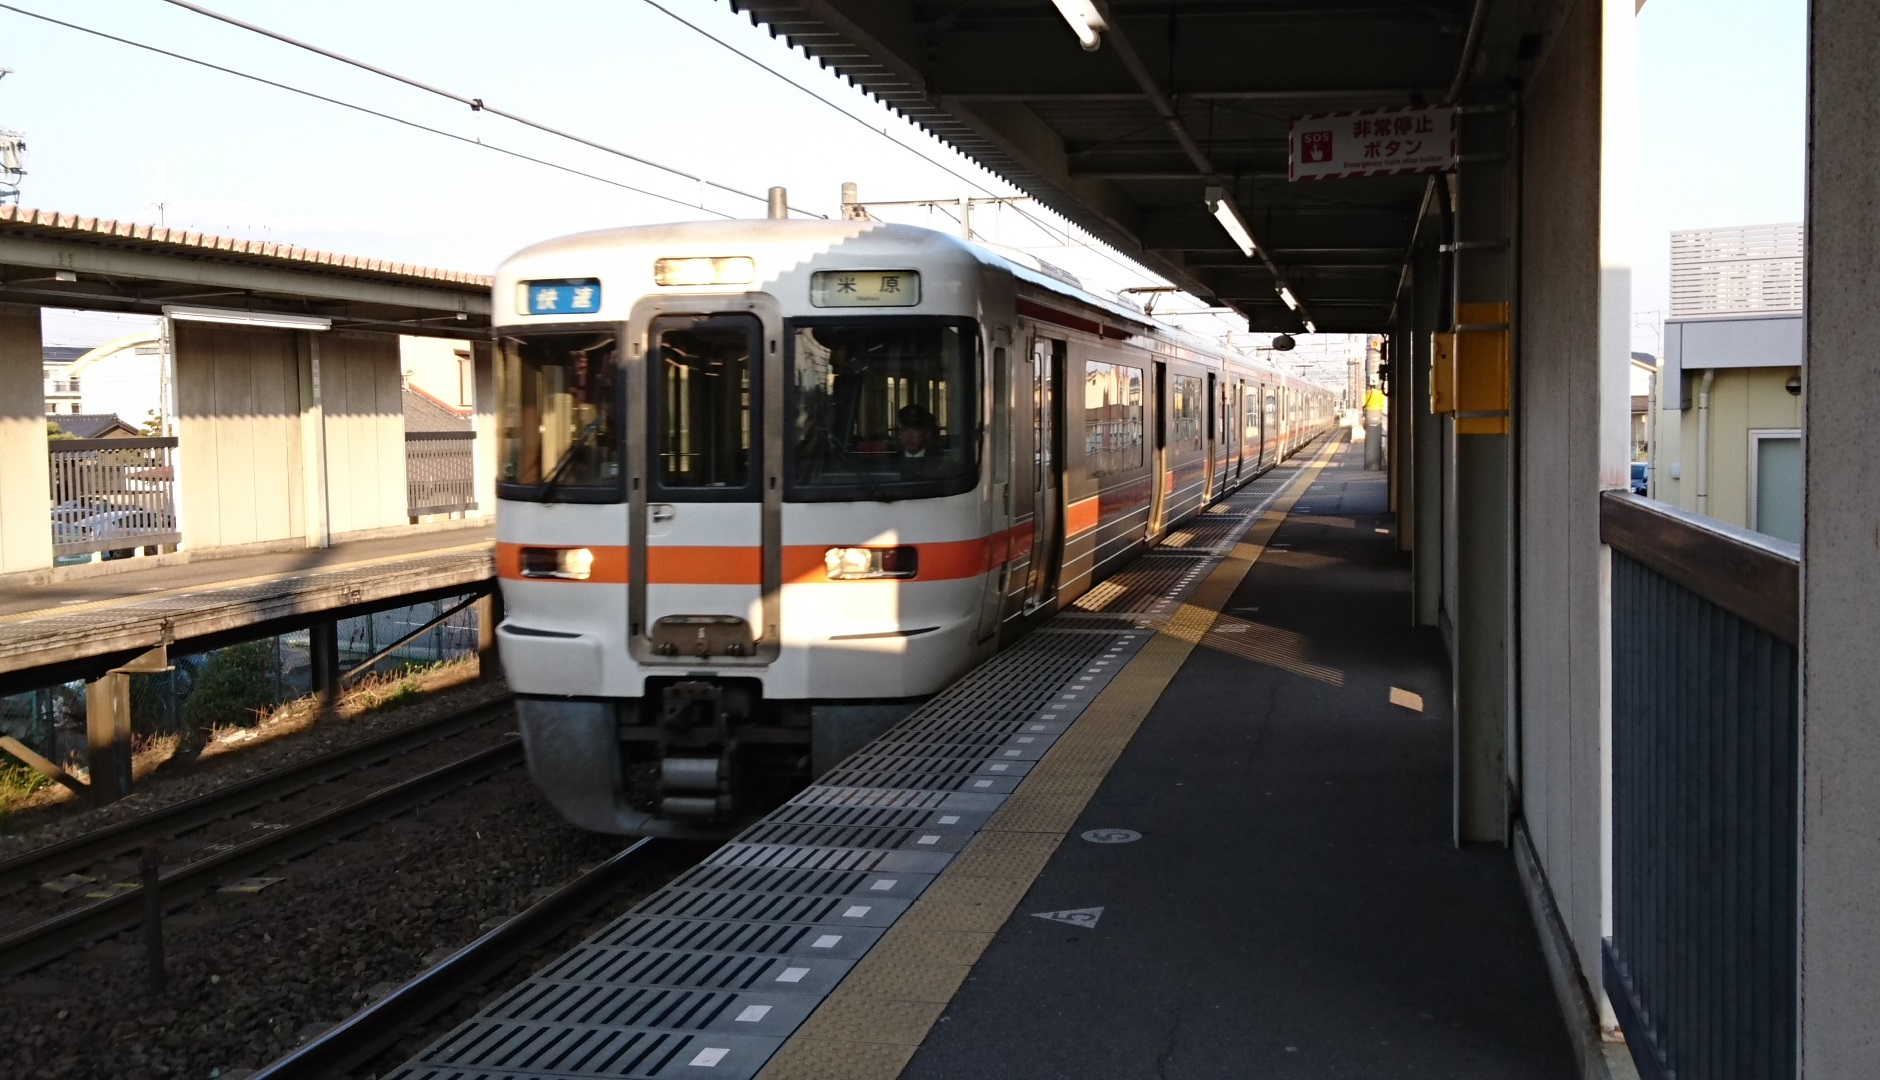 2017.3.27 東海道線 (19) 西岡崎 - 米原いき快速 1880-1080